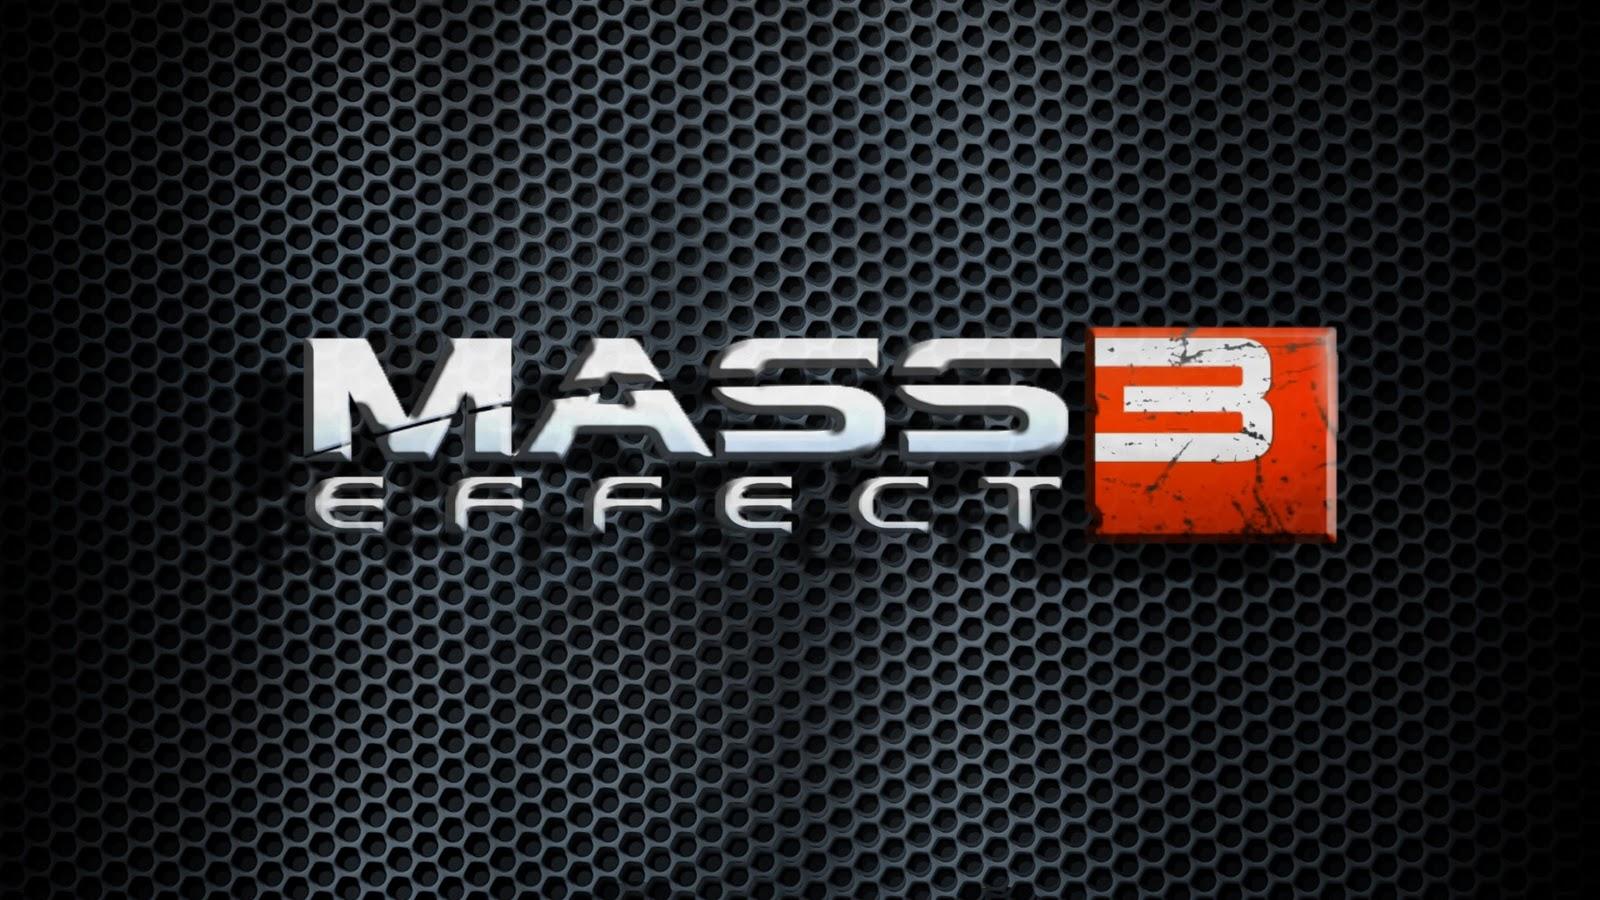 http://4.bp.blogspot.com/-yn2rNQDPIMI/TtlPIiNePSI/AAAAAAAAJkc/v3mXZvARGk4/s1600/Mass+Effect+3+HD+Wallpapers%252C+Game+Wallpaper+11.jpg